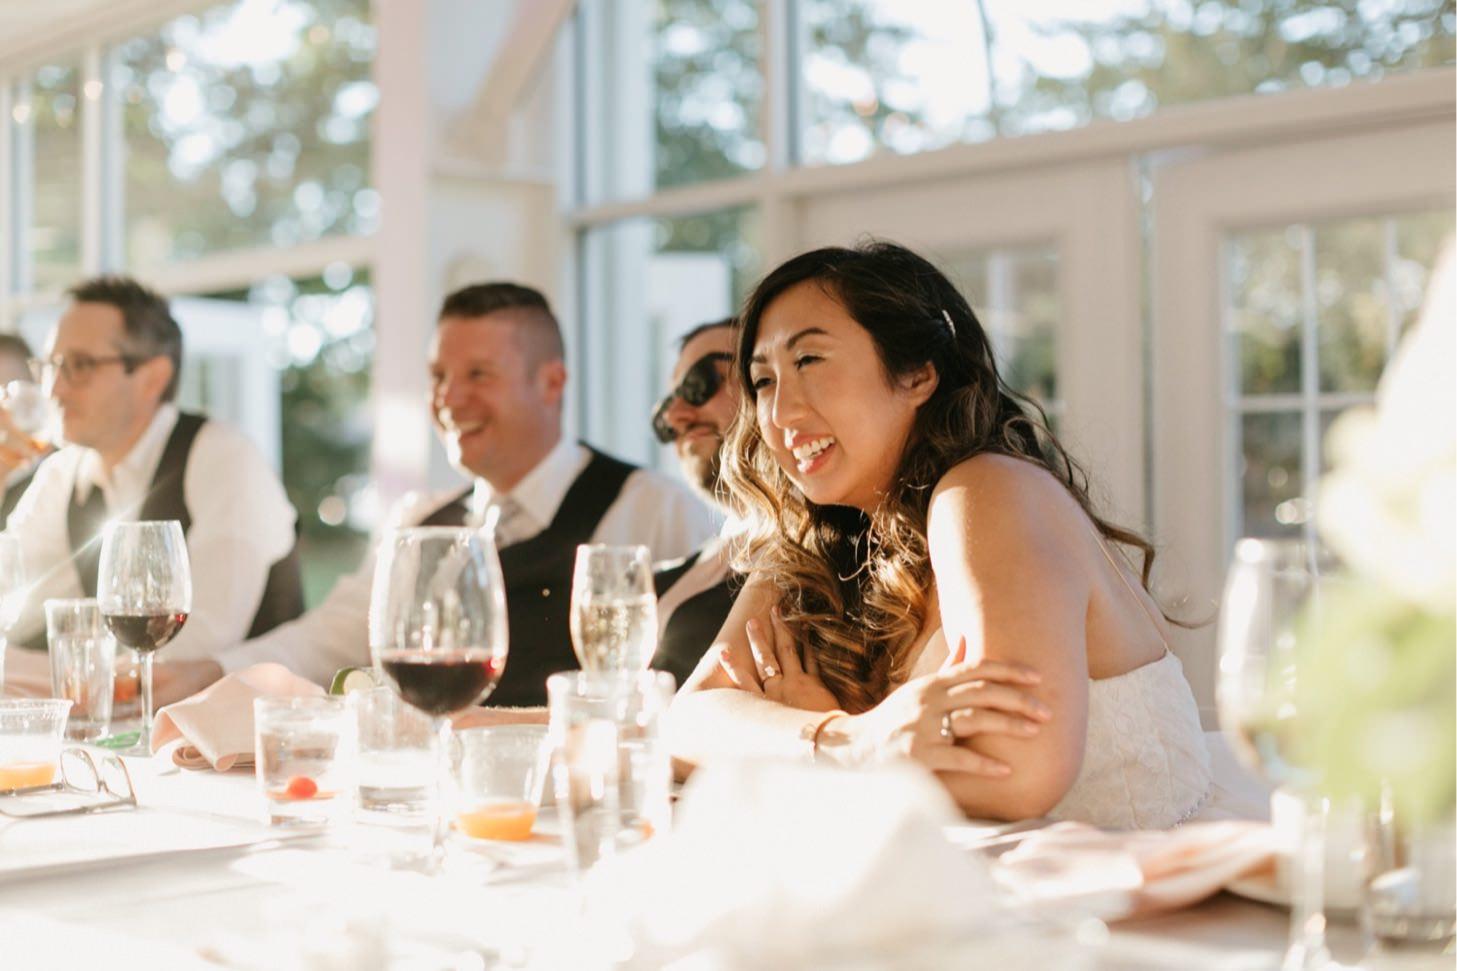 ritz-charles-wedding-reception-downtown-indianapolis-wedding-photographer040.JPG